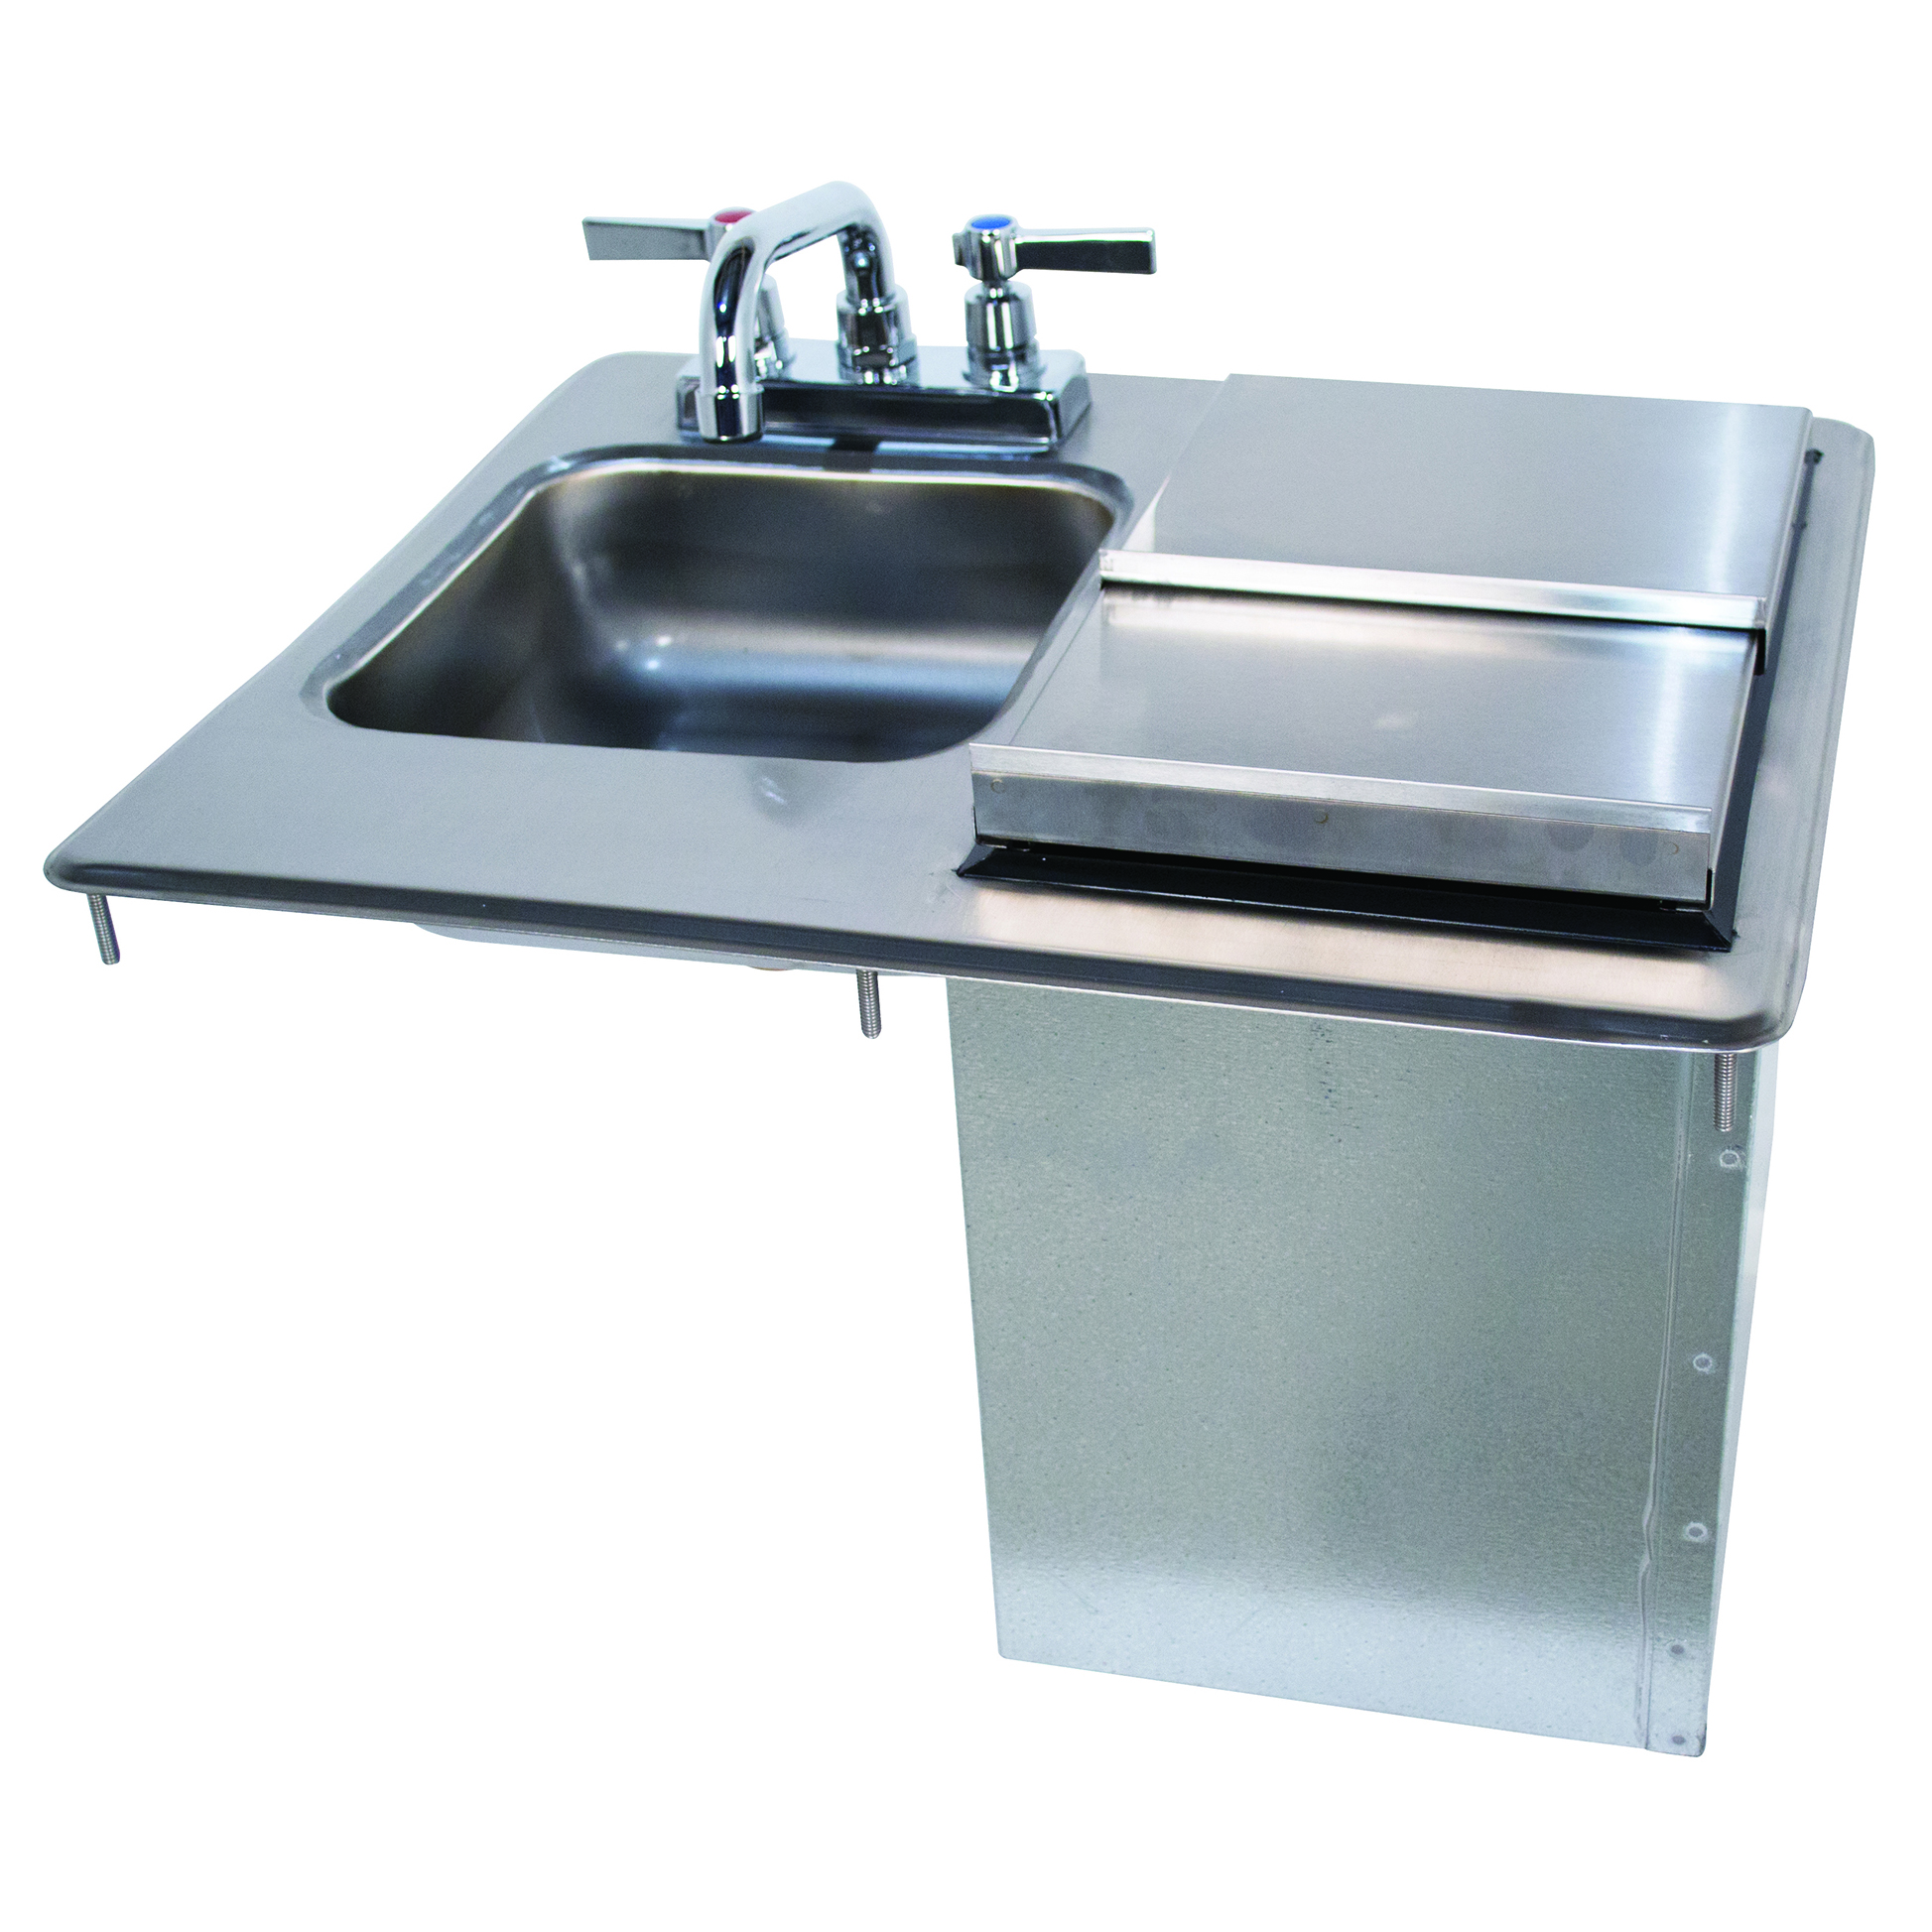 Advance Tabco D-24-SIBL-X sink, drop-in